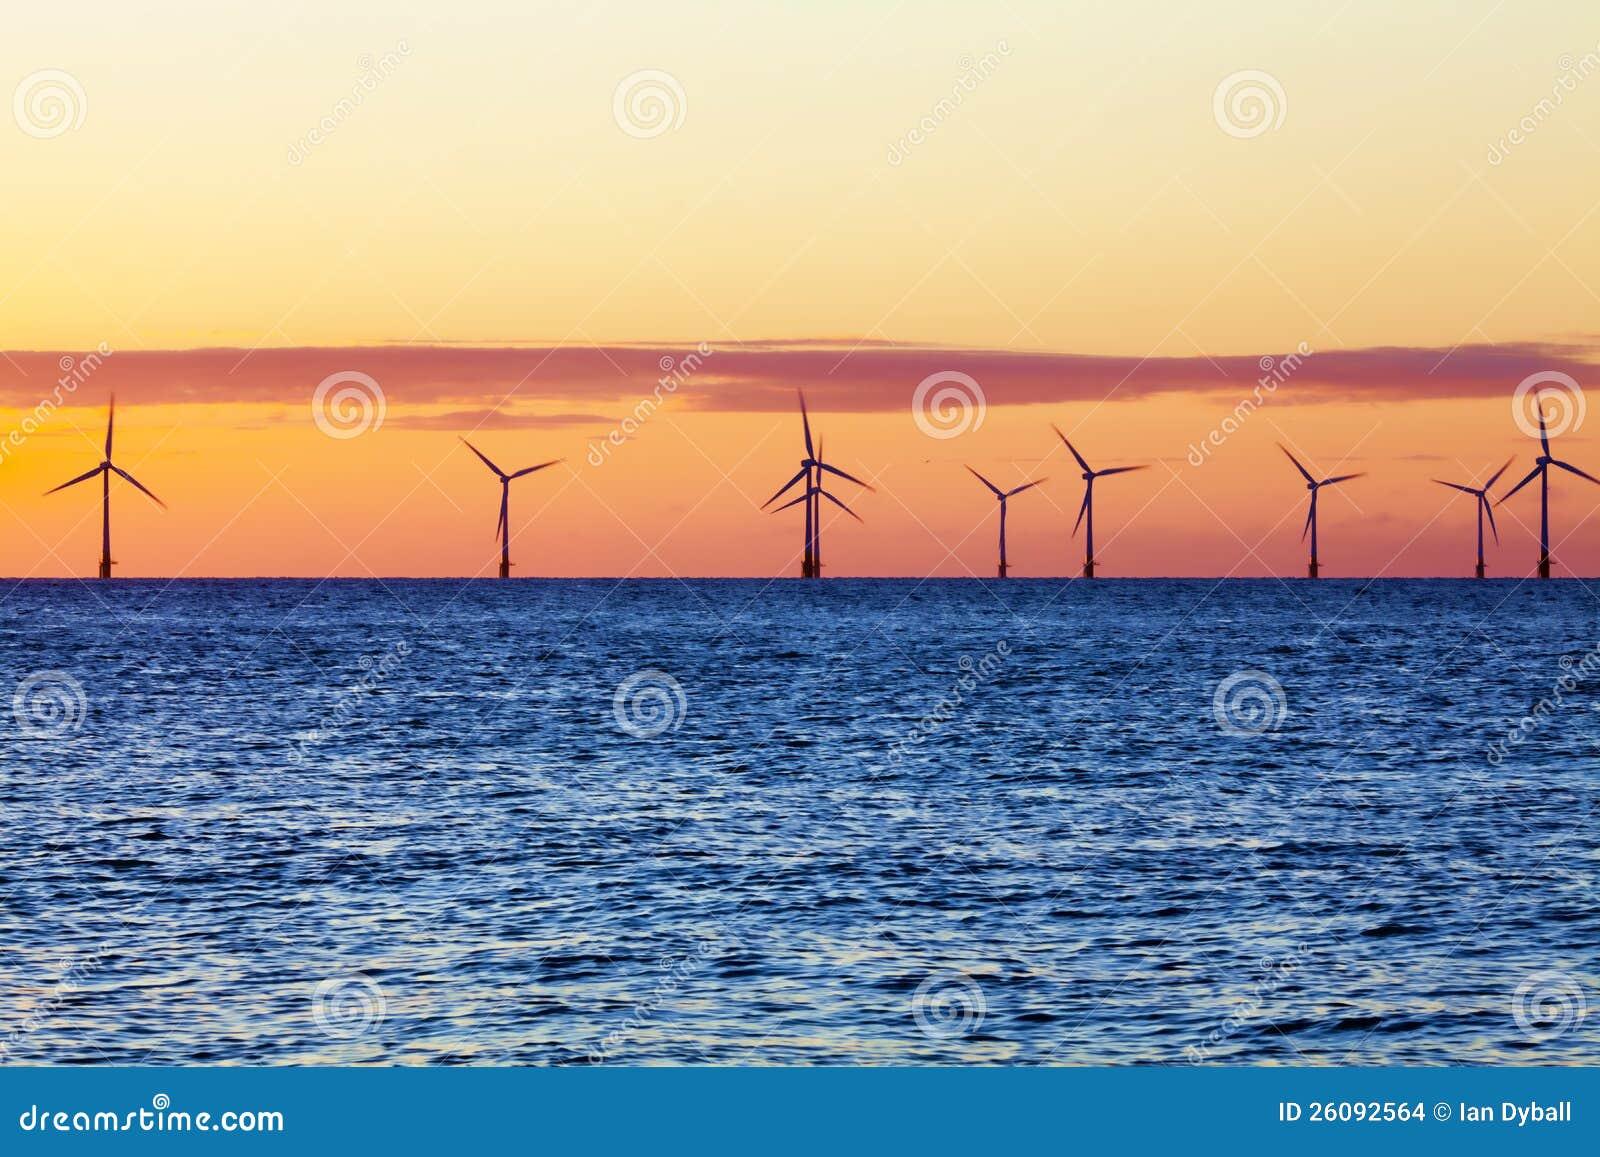 Offshore_wind_farm